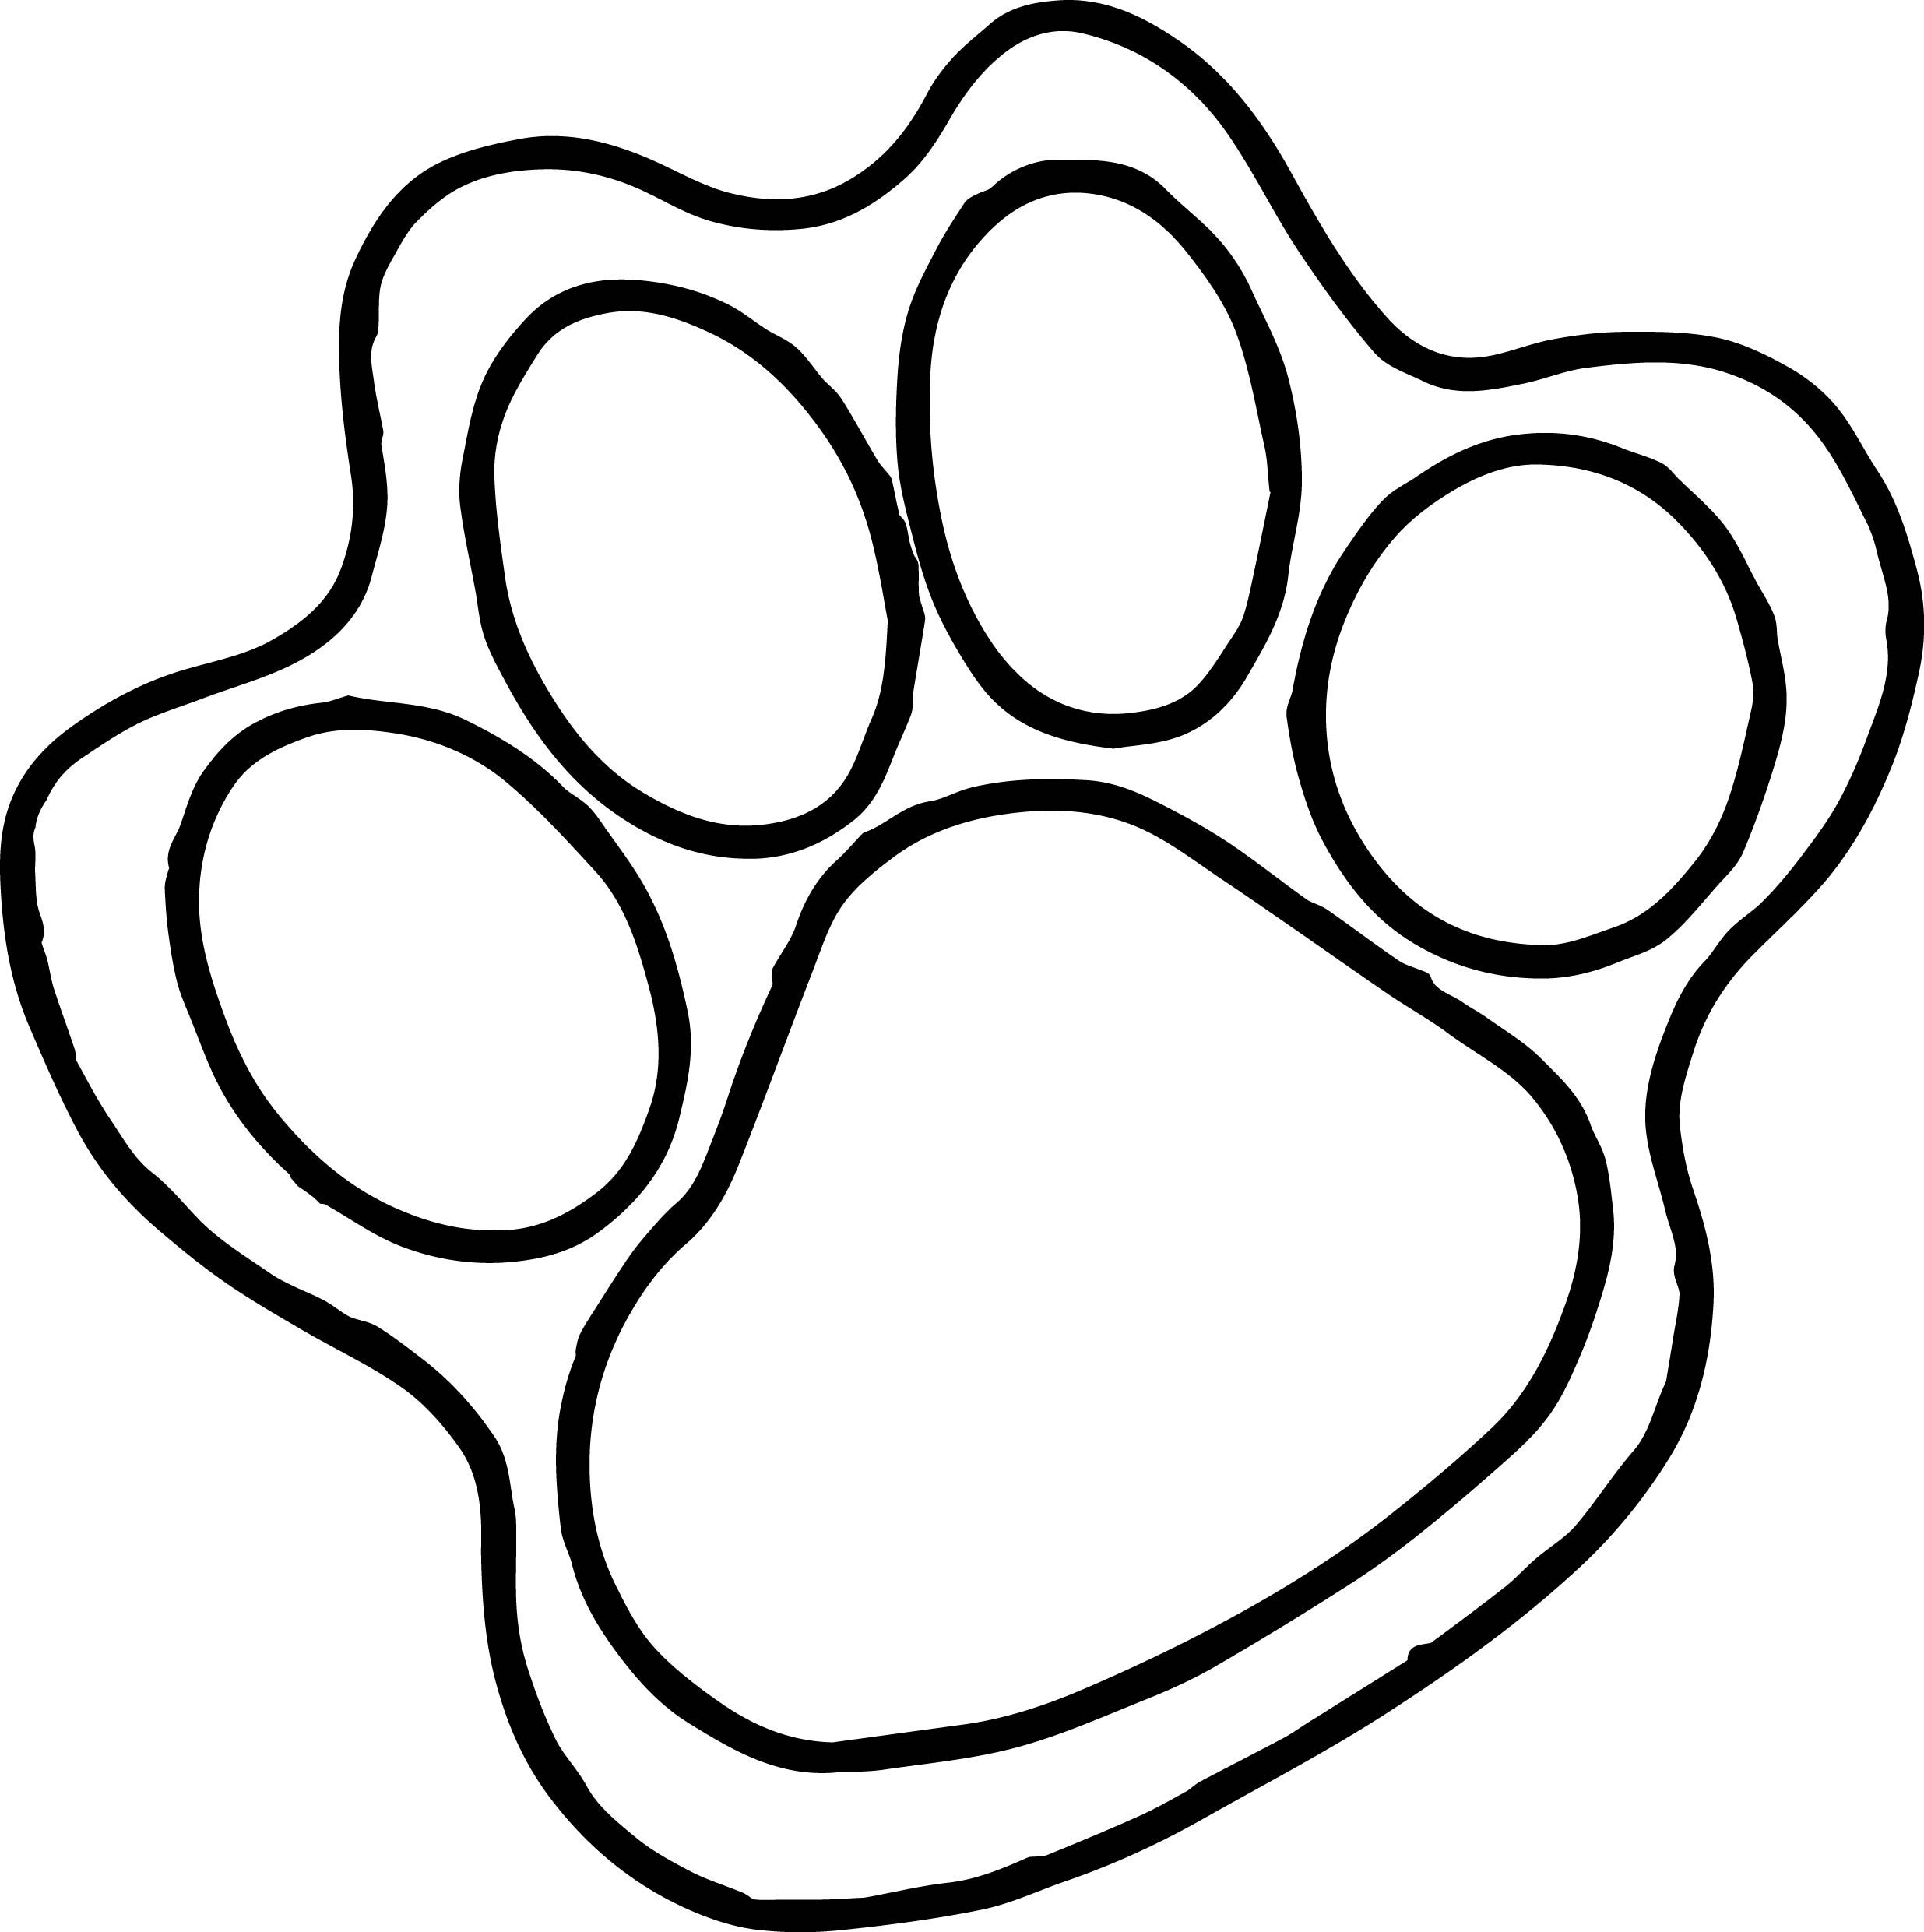 Tiger Paw Coloring Page  PeepsBurgh